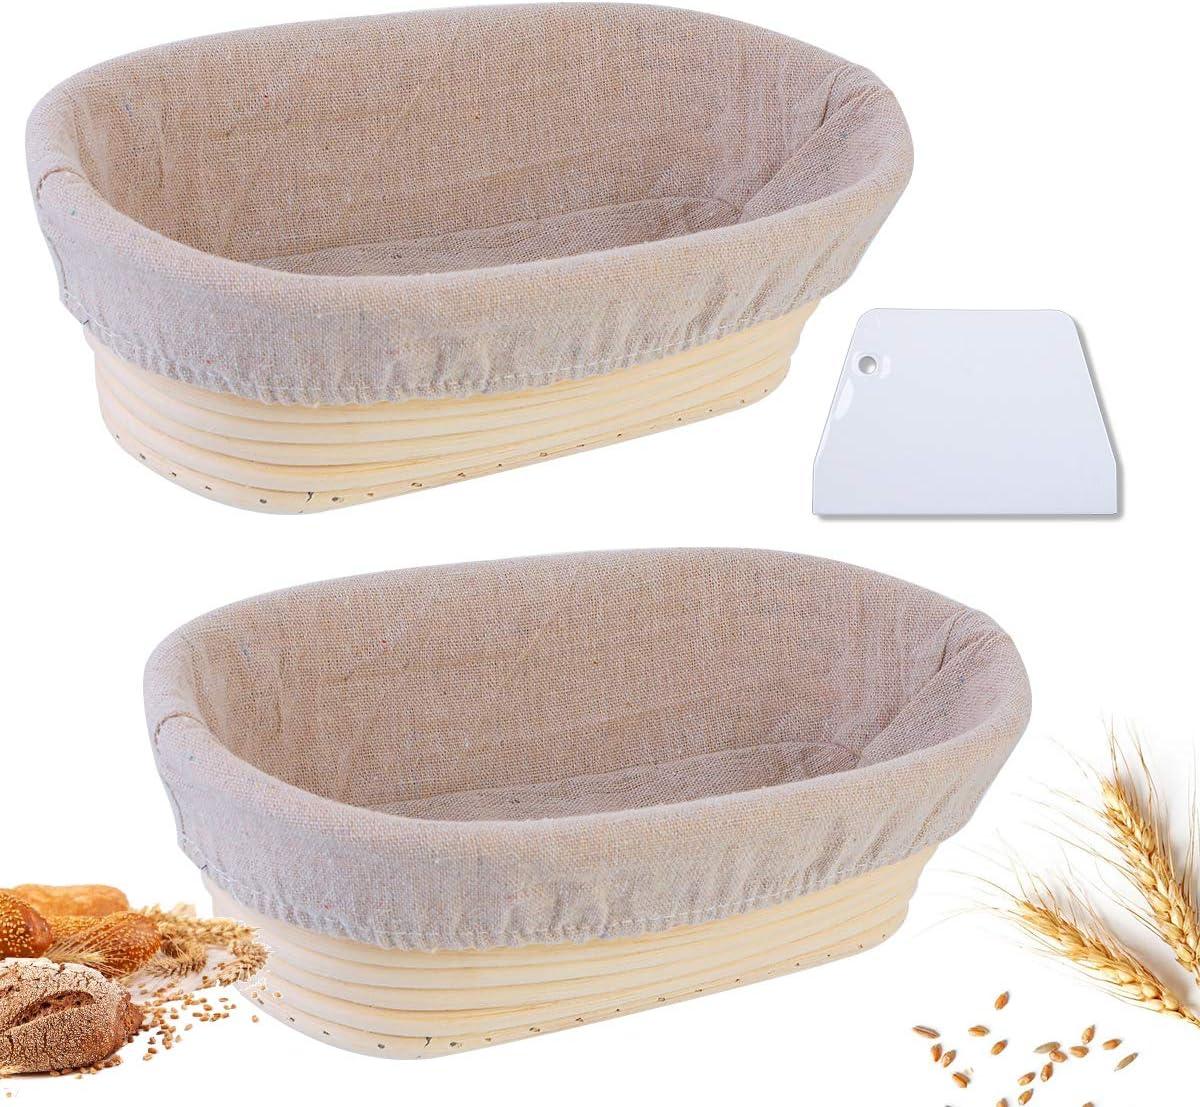 Set of 2 Bread Proofing Basket Brotform Banneton Proofing Basket with Linen Liner Cloth /& Dough Scraper for Home Baker Bread Banneton Proofing Baskets